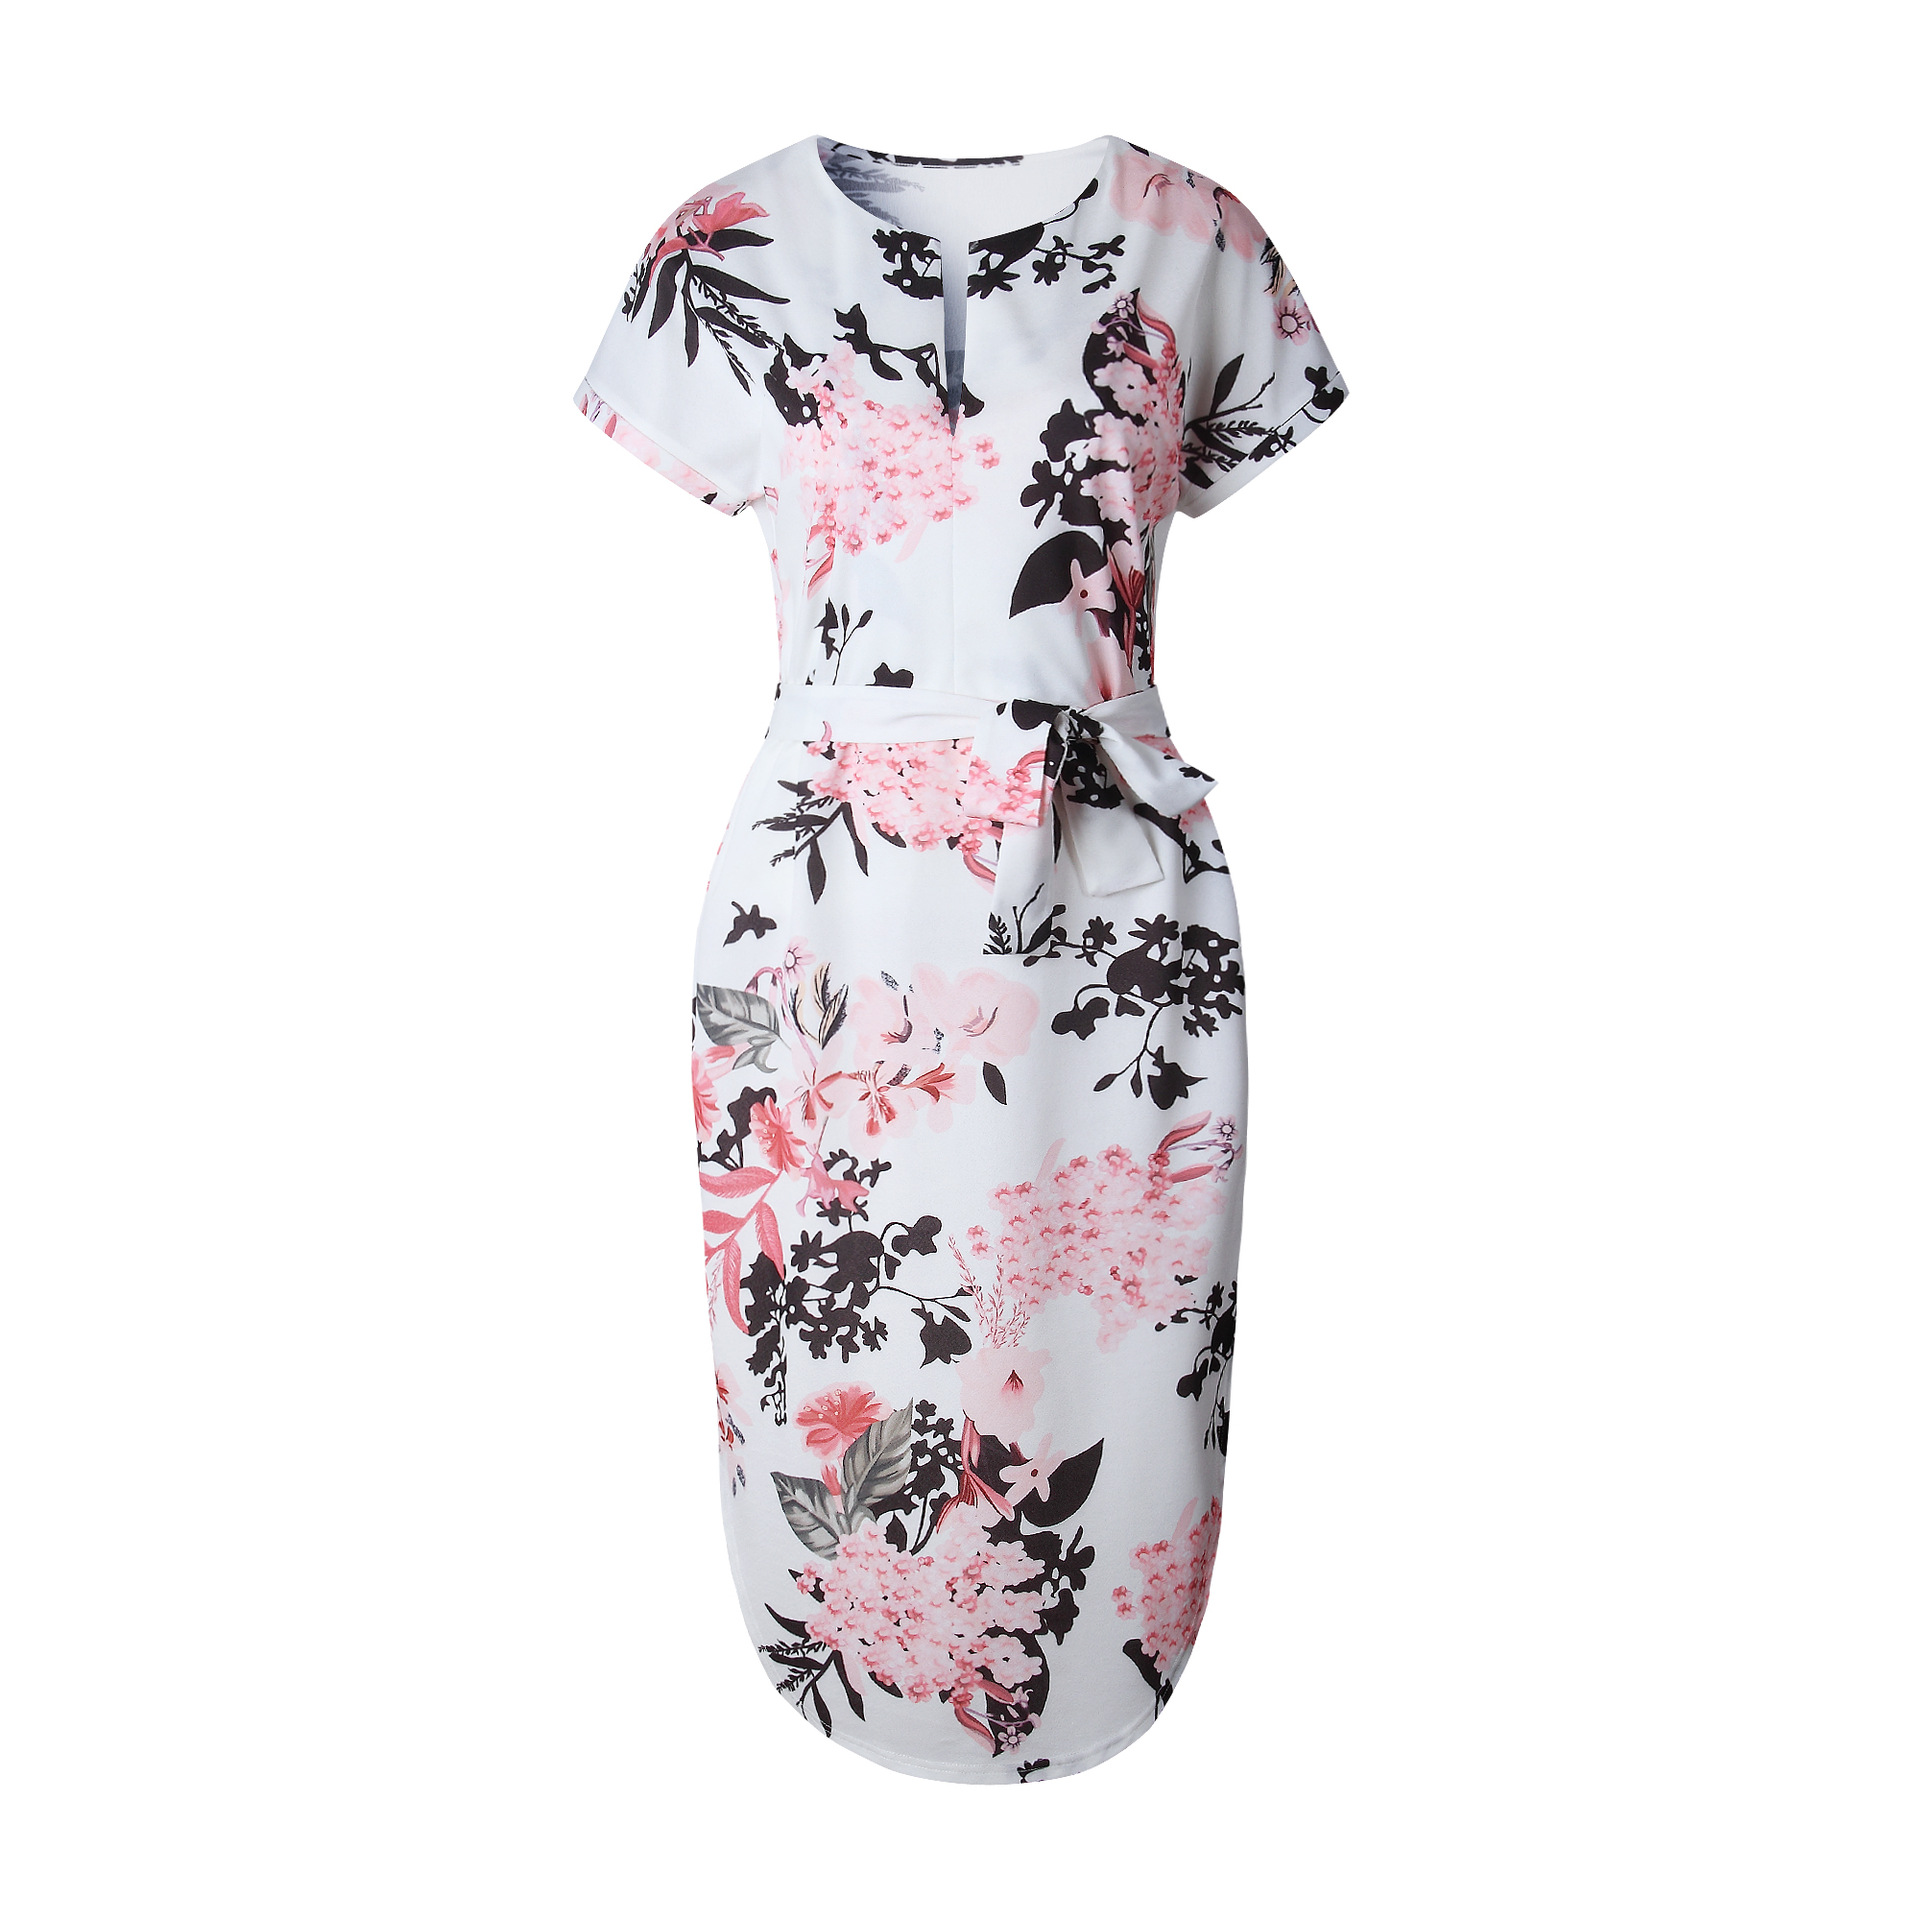 2018 Summer Dress Women Print V Neck Short Sleeve Robe Female Dresses Casual Sashes Midi Dress Ladies Elegant Vestidos Dropship 16